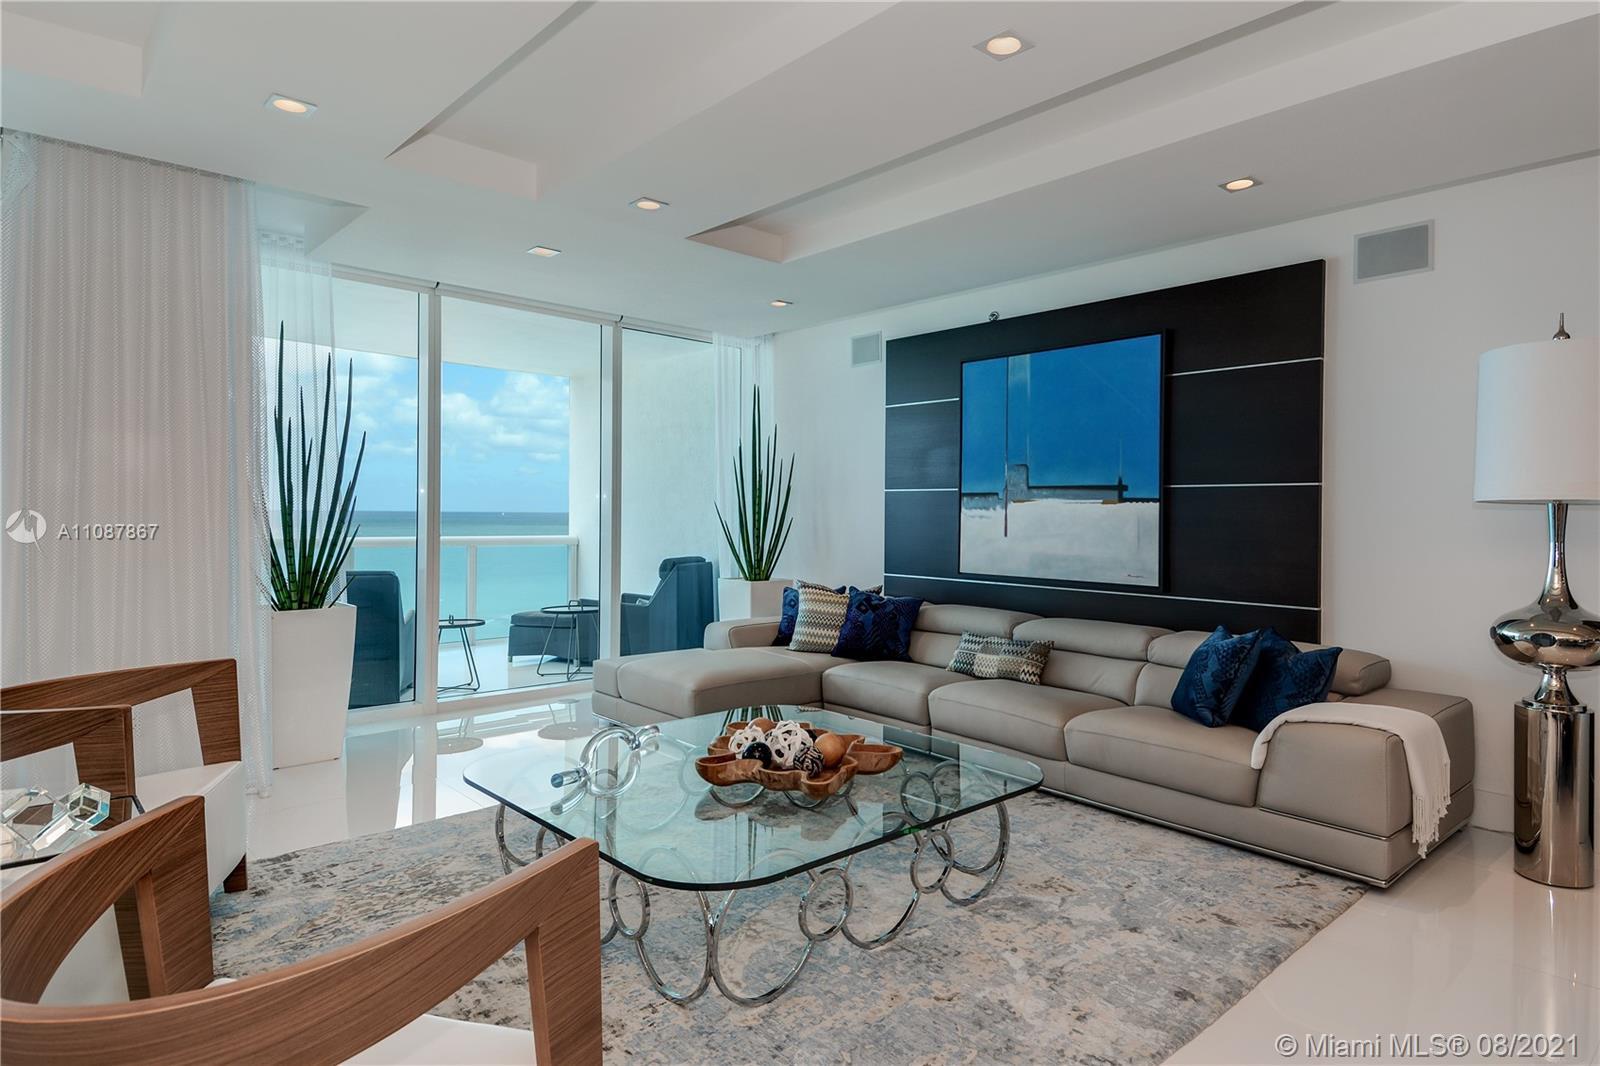 2711 S Ocean Dr, Unit #803 Luxury Real Estate